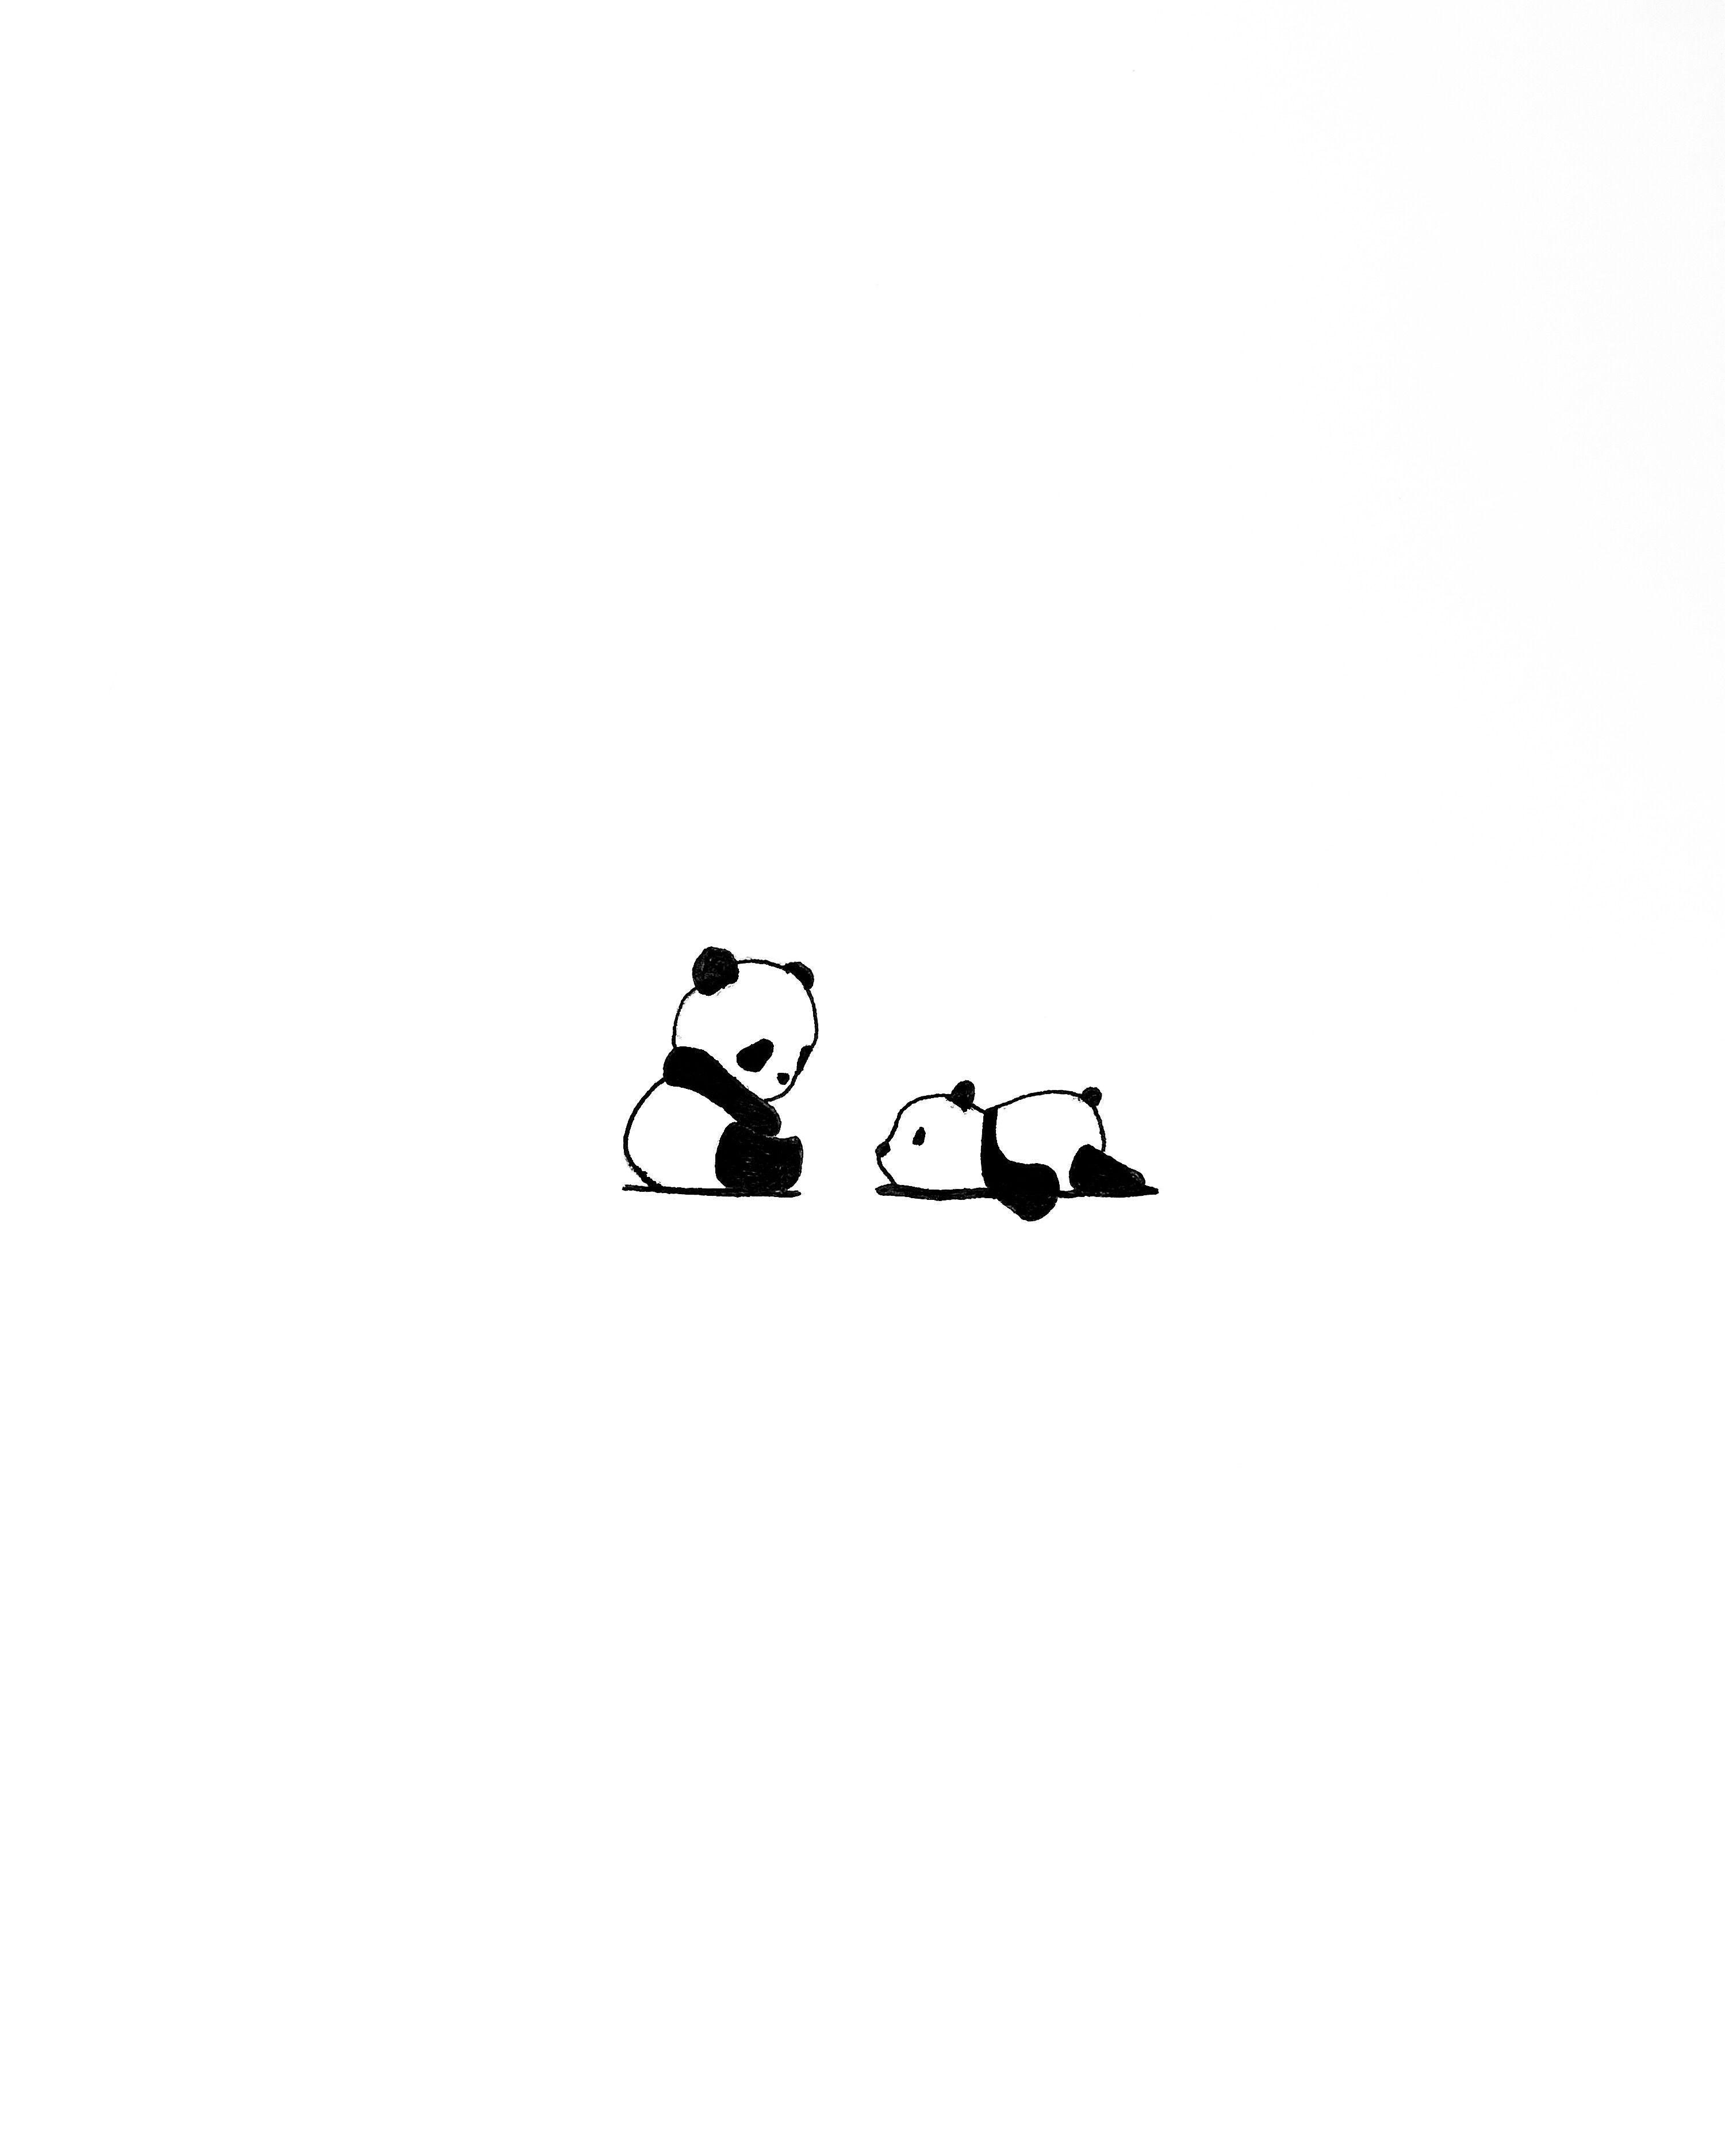 Lazy Panda Homedecor Redo Micron Black White Miniaturas Minimalism Cute Panda Wallpaper Cute Simple Wallpapers Cute Little Drawings